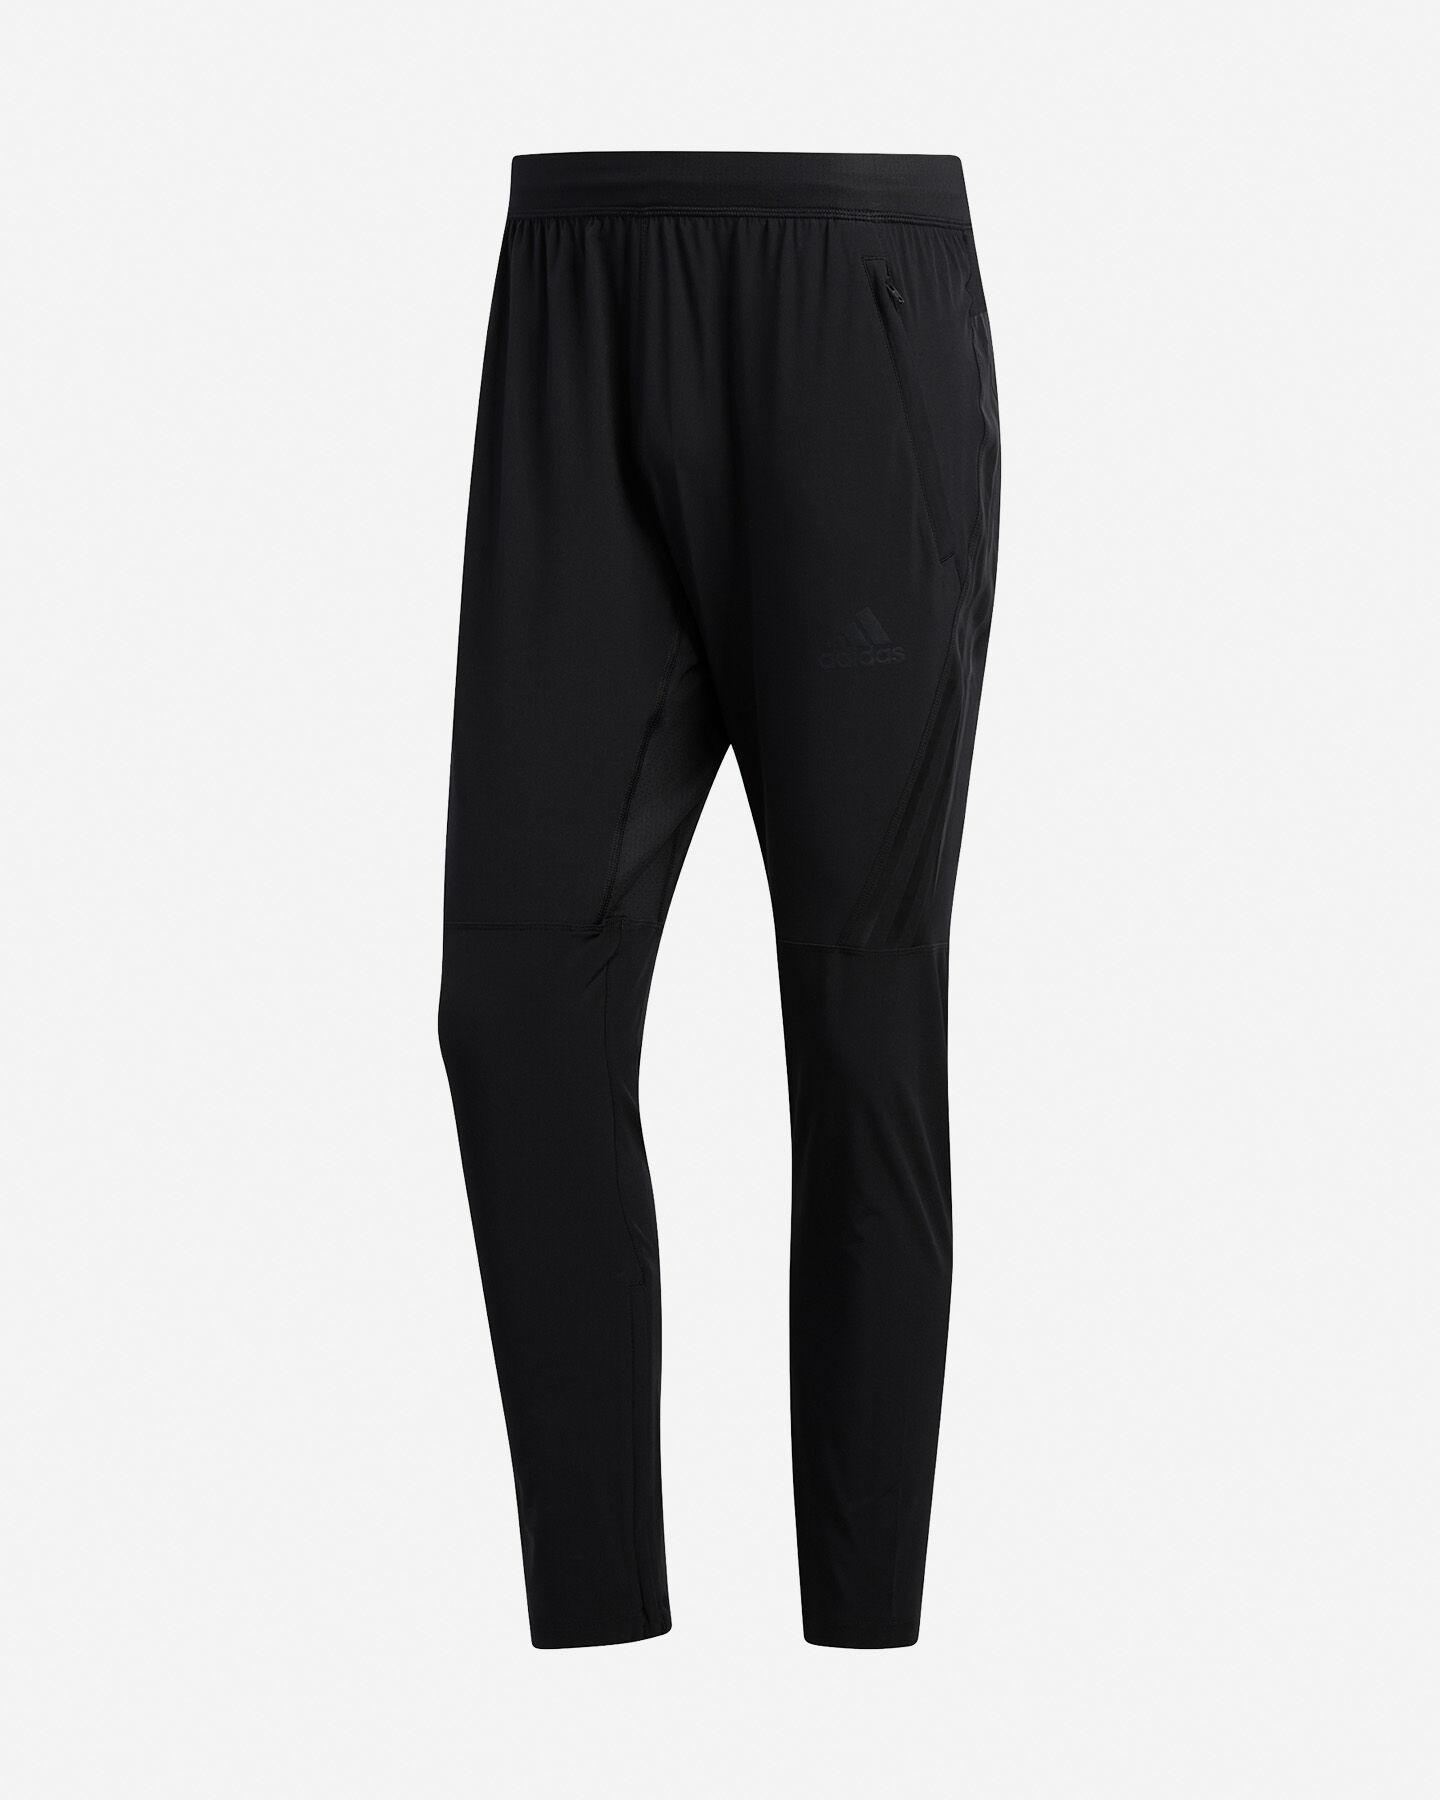 Pantalone training ADIDAS AEROREADY 3-STRIPES M S5154644 scatto 0